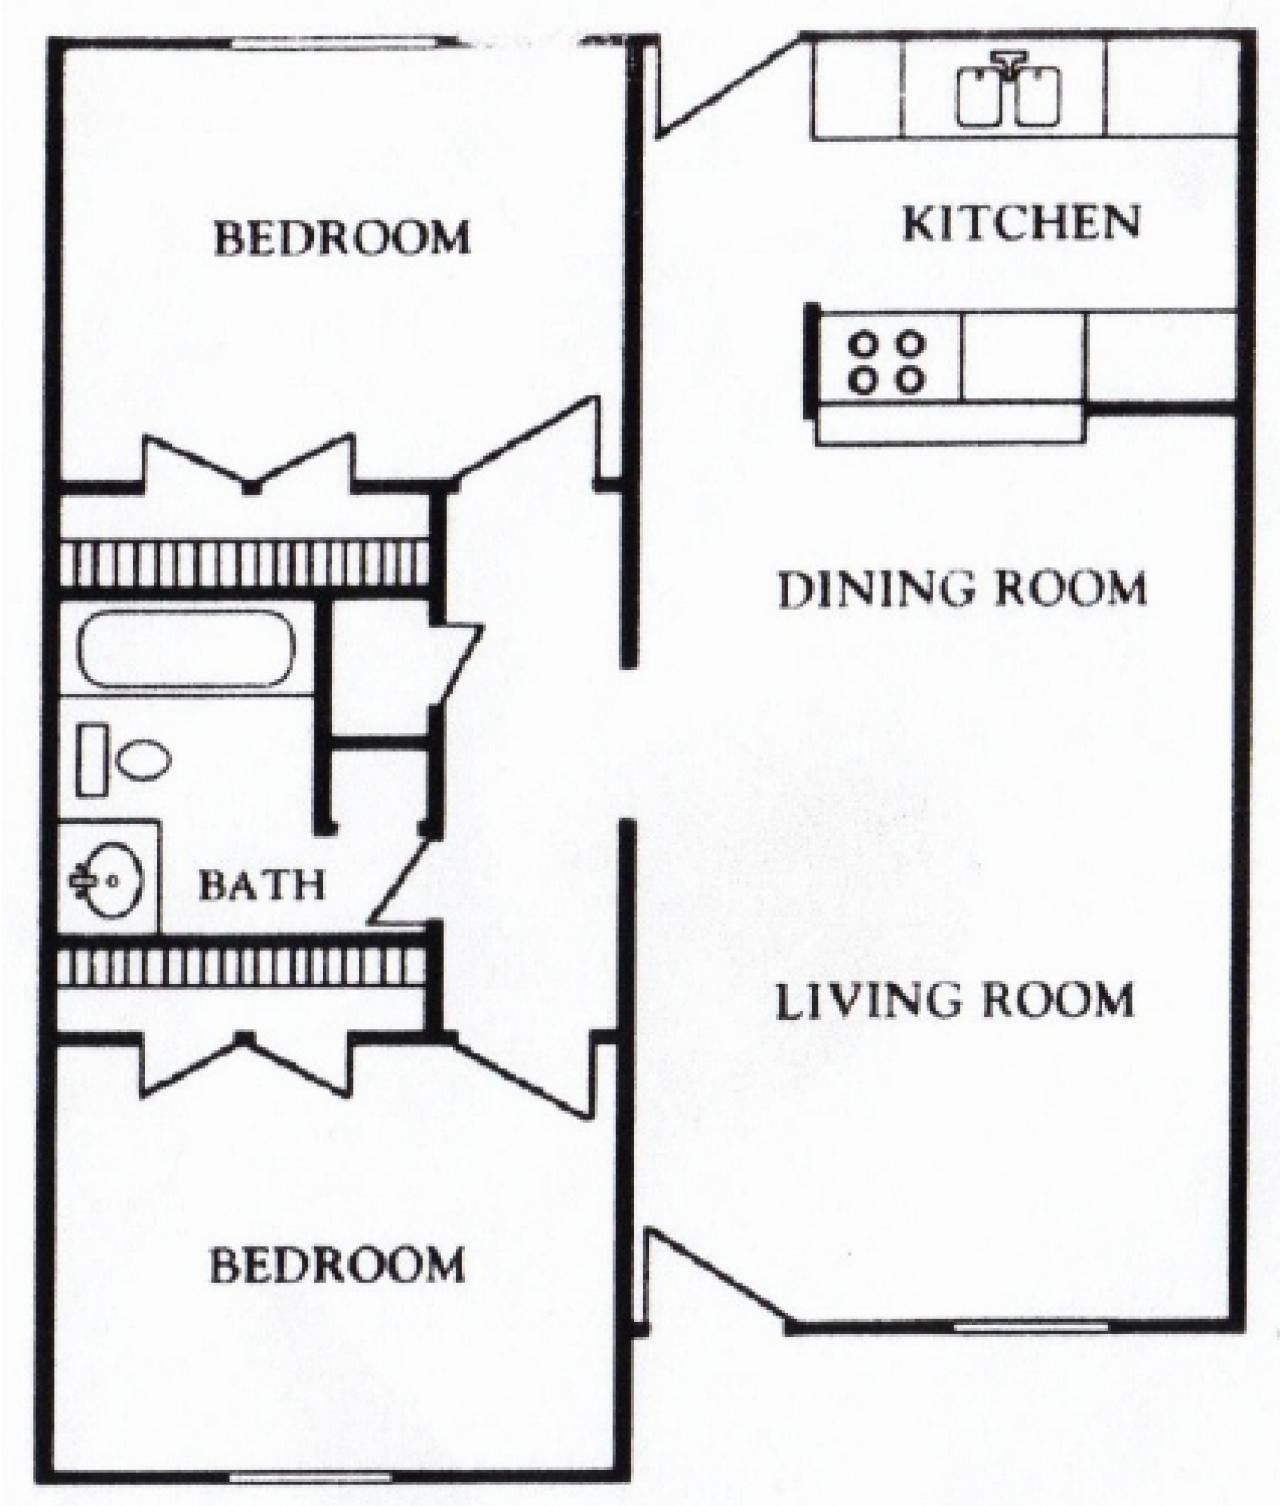 Houston Texas Apartment - Mont Belvieu Floor Plan 2 bed 1 bath 718 sq ft